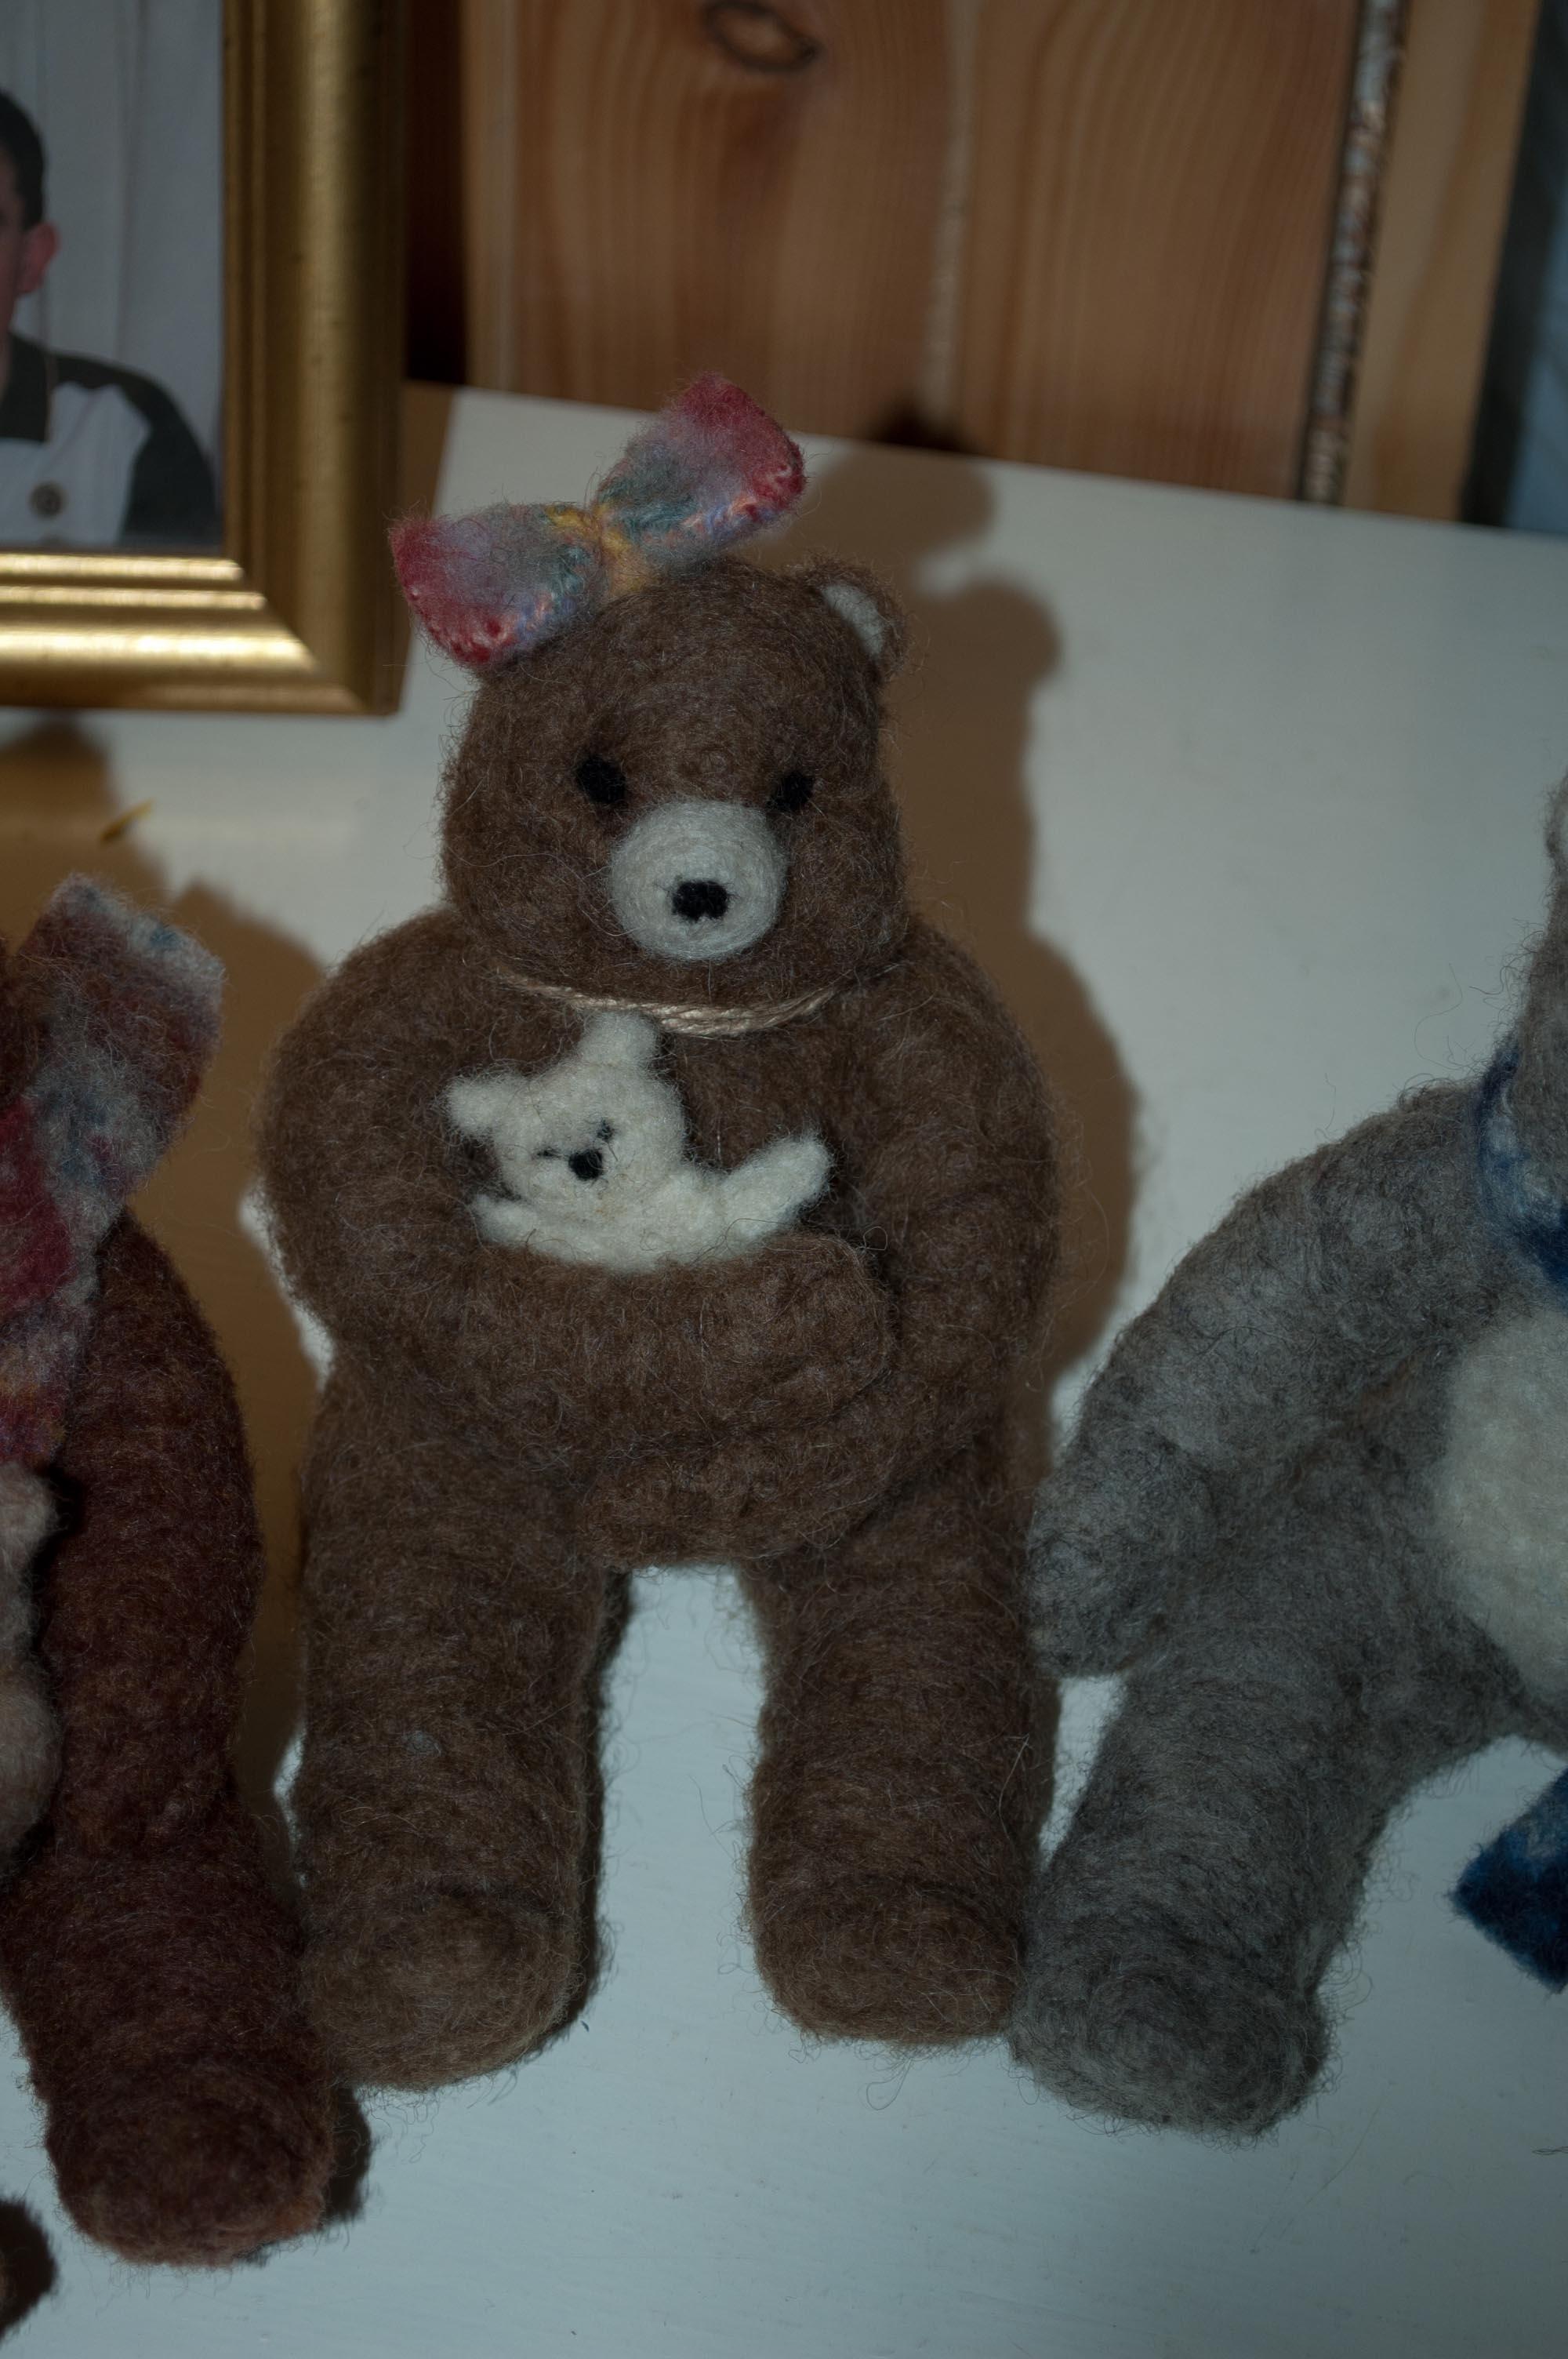 oo-bears-4